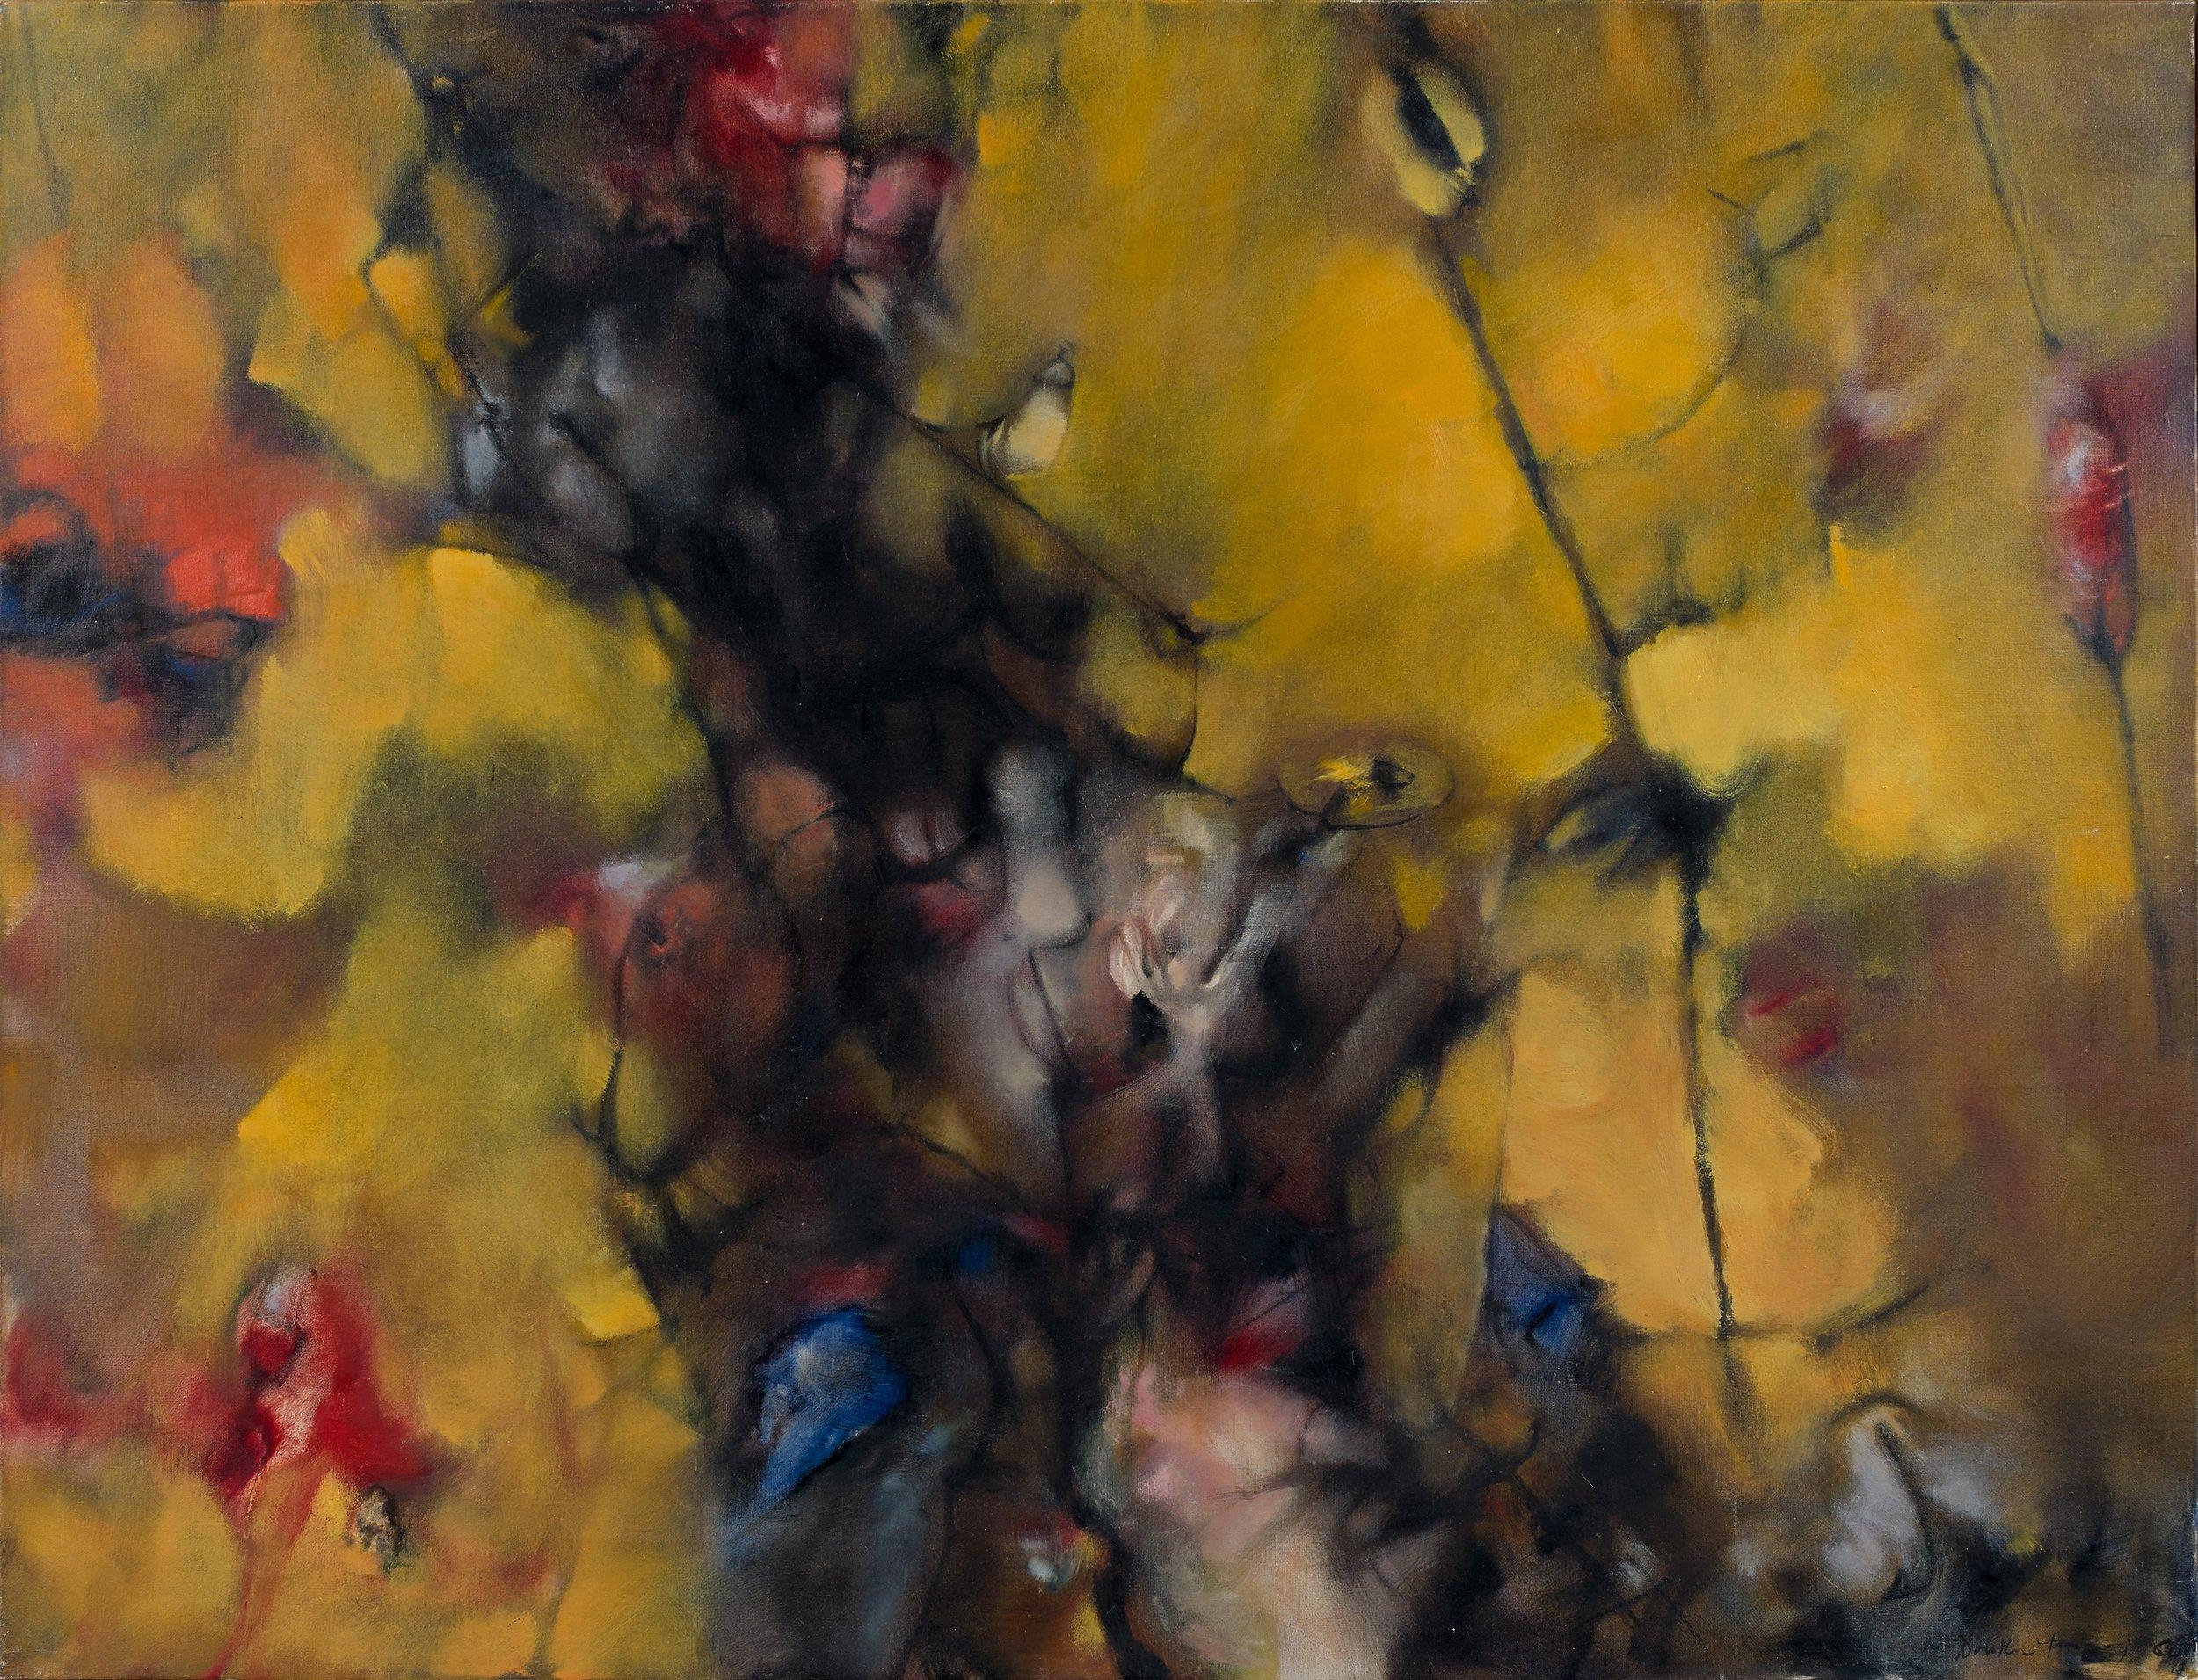 Dorothea Tanning,  Visite jaune (Visite éclair),  1960, oil on canvas, 35 x 45 inches (89 x 116 cm)